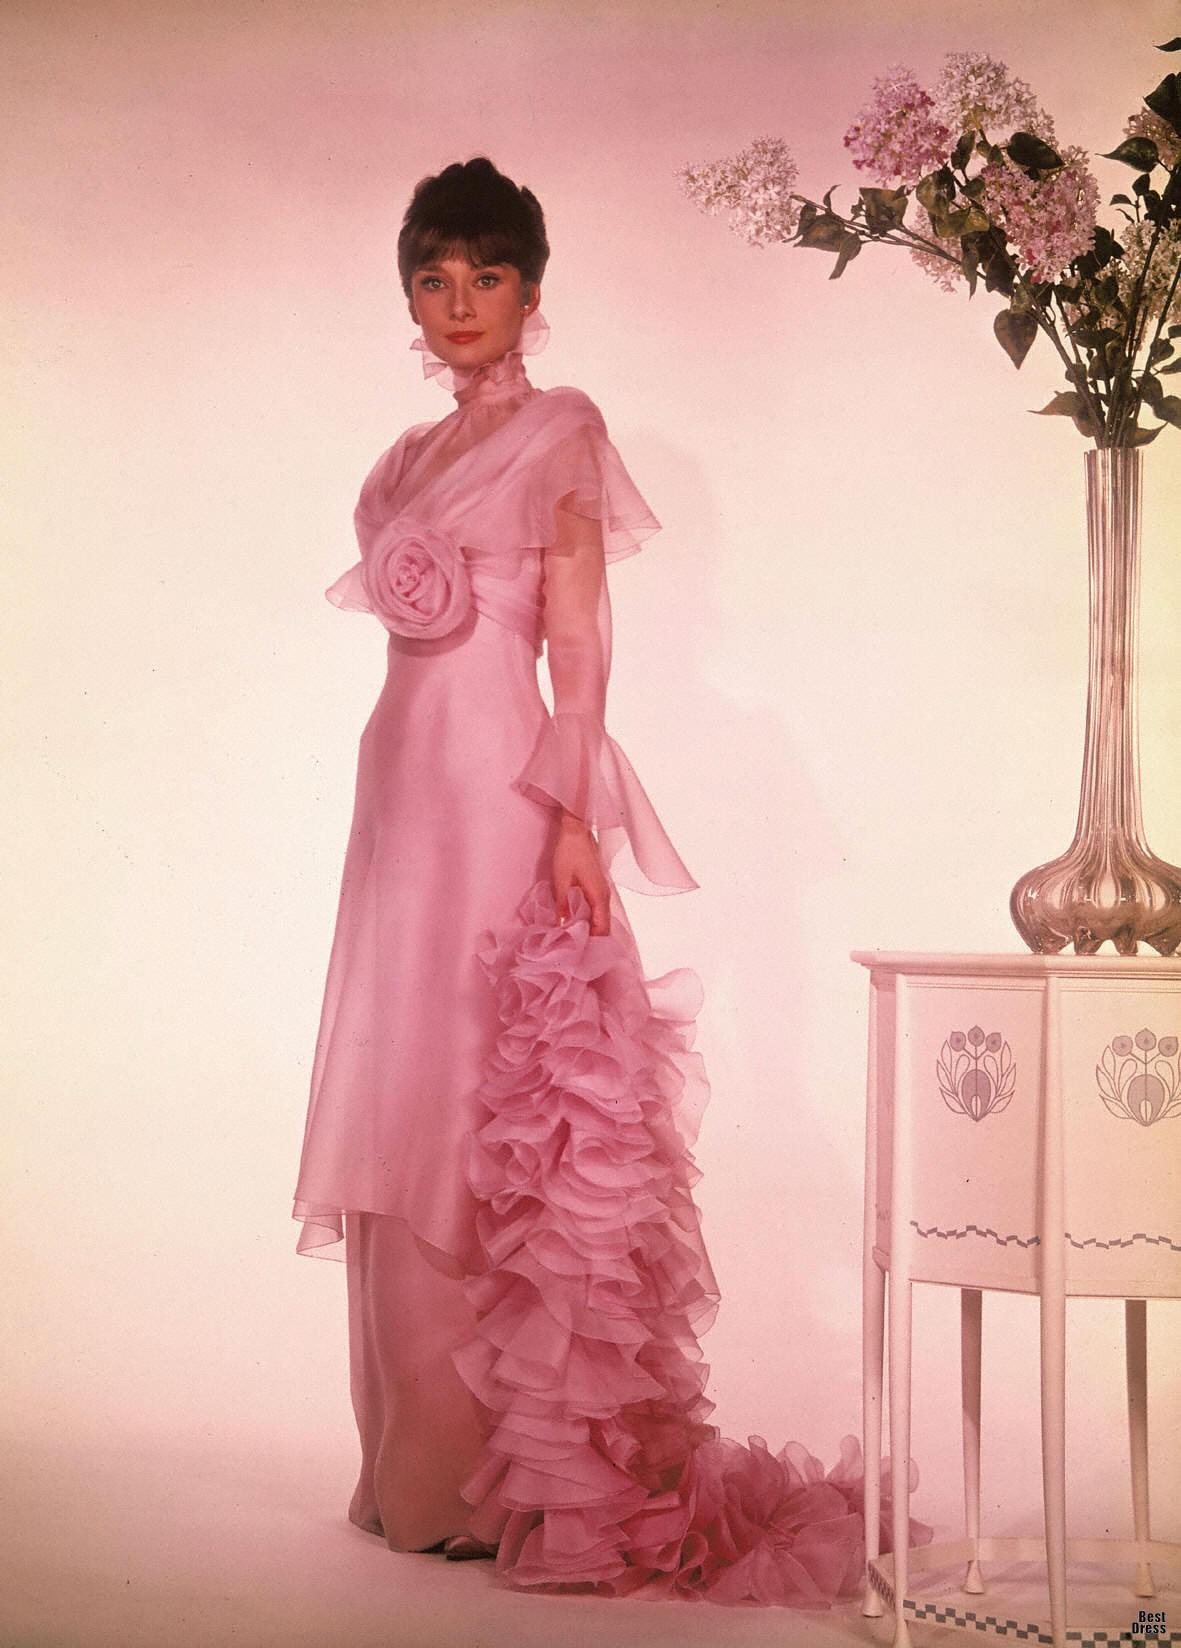 my fair lady | Una vitrina llena de tesoros (Barbie blog)